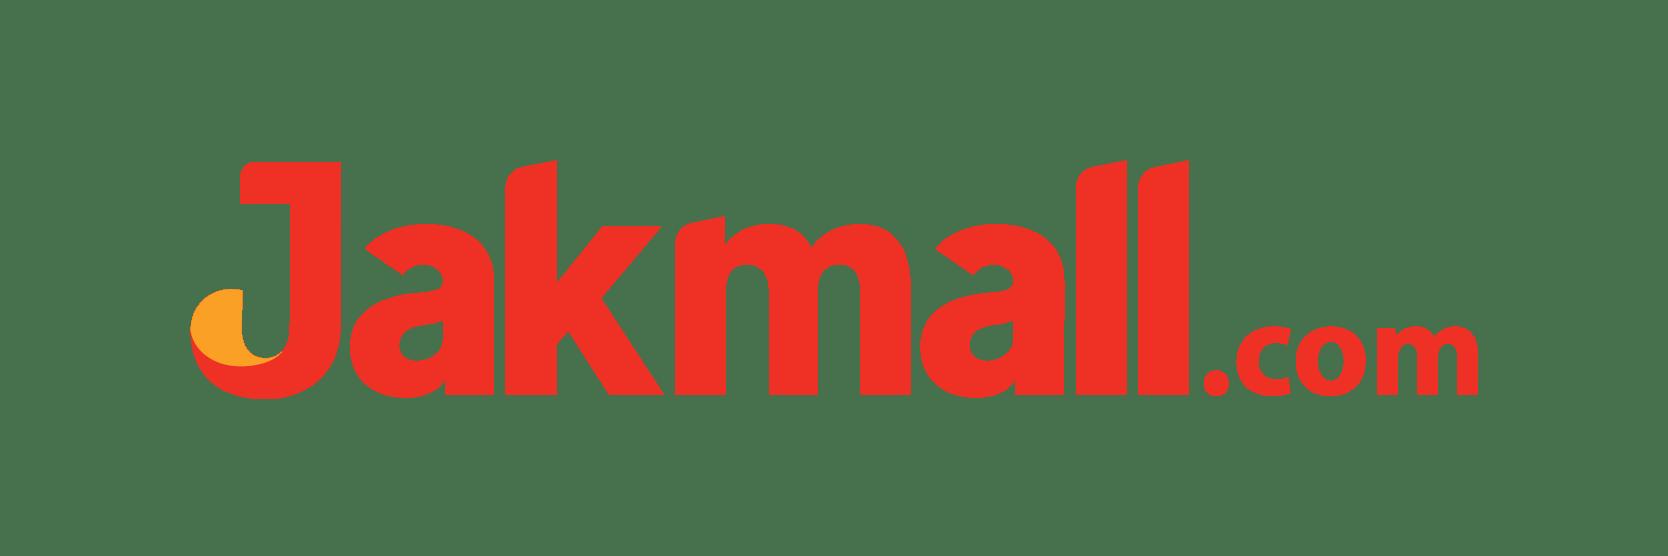 Promo Jakmall